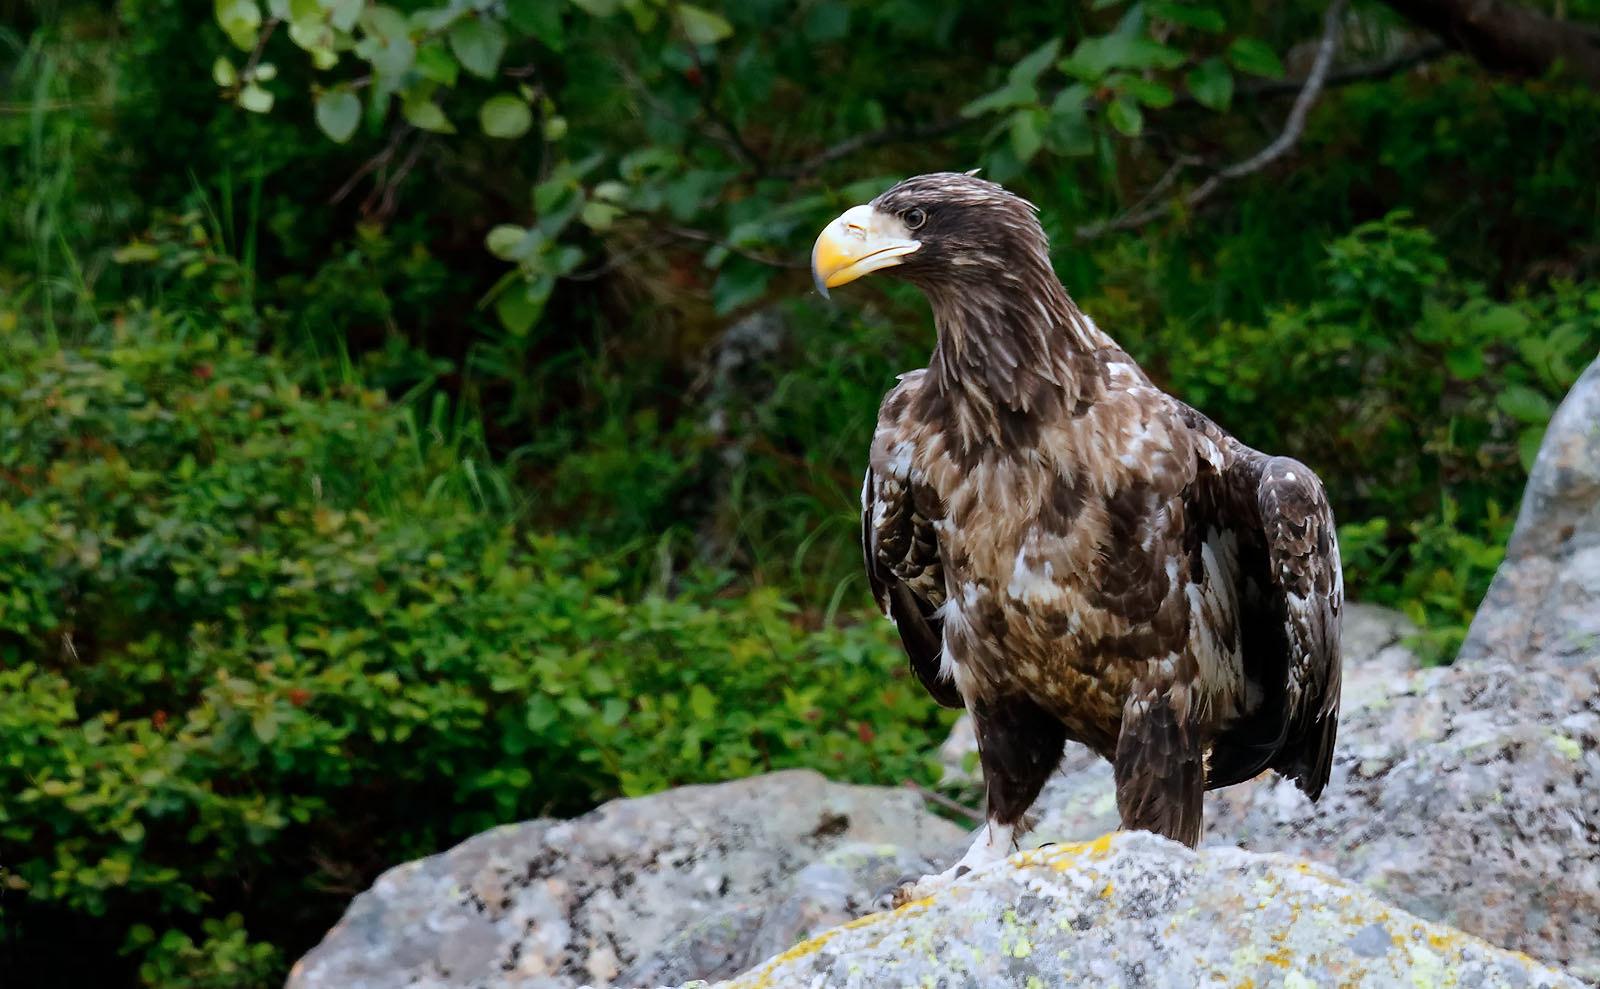 Steller's Eagle - immature